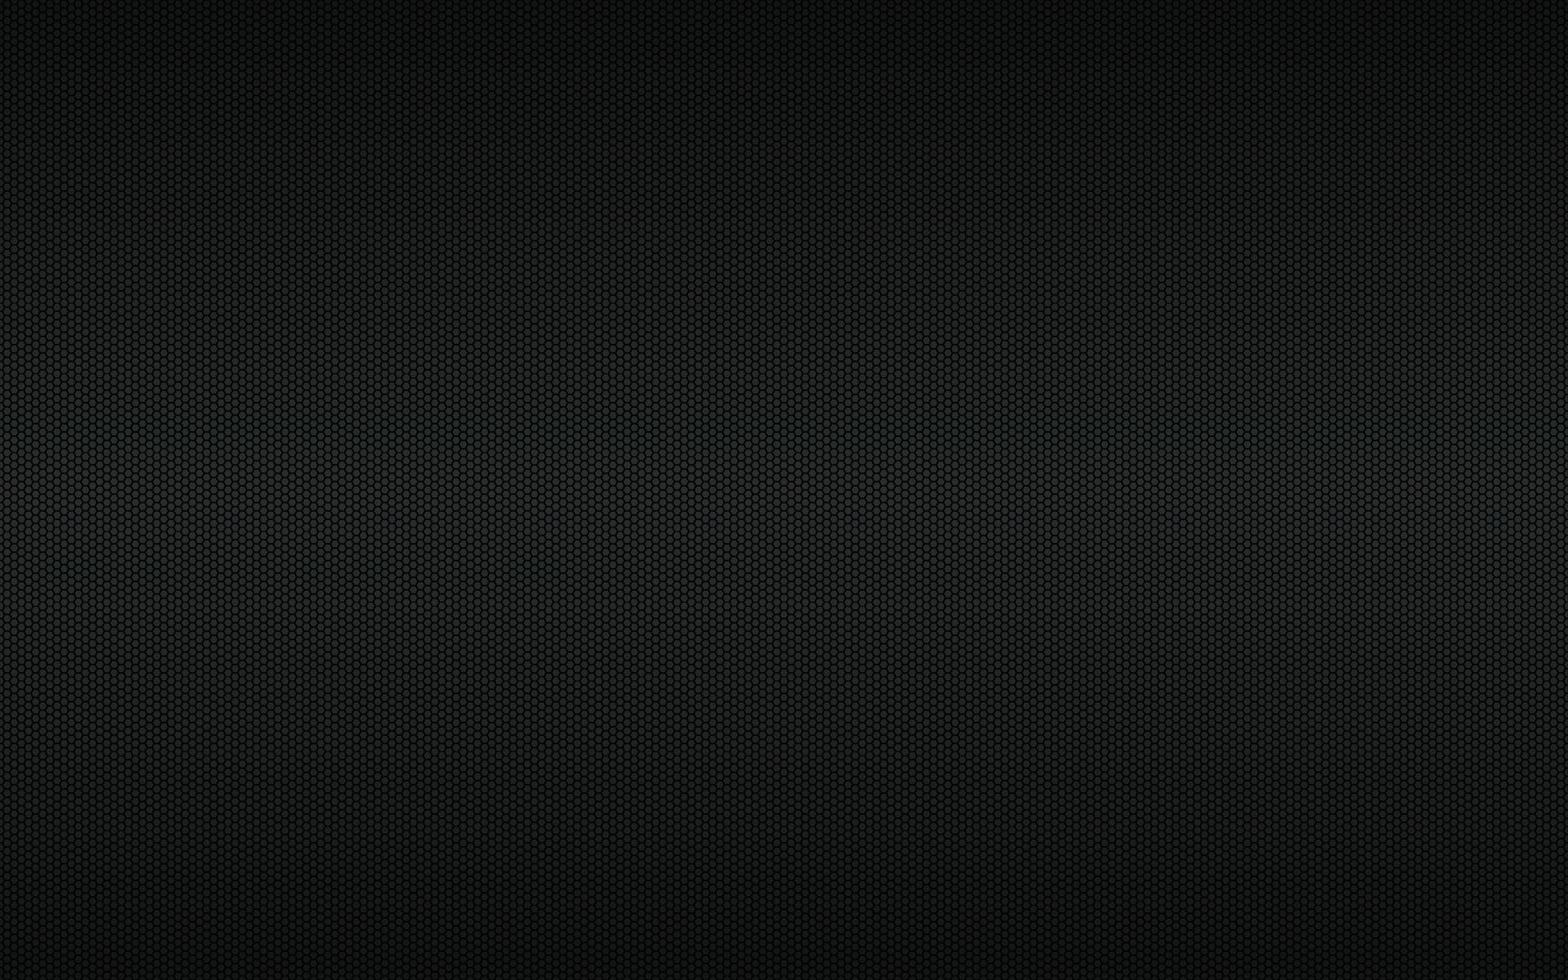 Fondo geométrico negro moderno de alta resolución con rejilla poligonal. patrón hexagonal metálico negro abstracto. ilustración vectorial simple vector